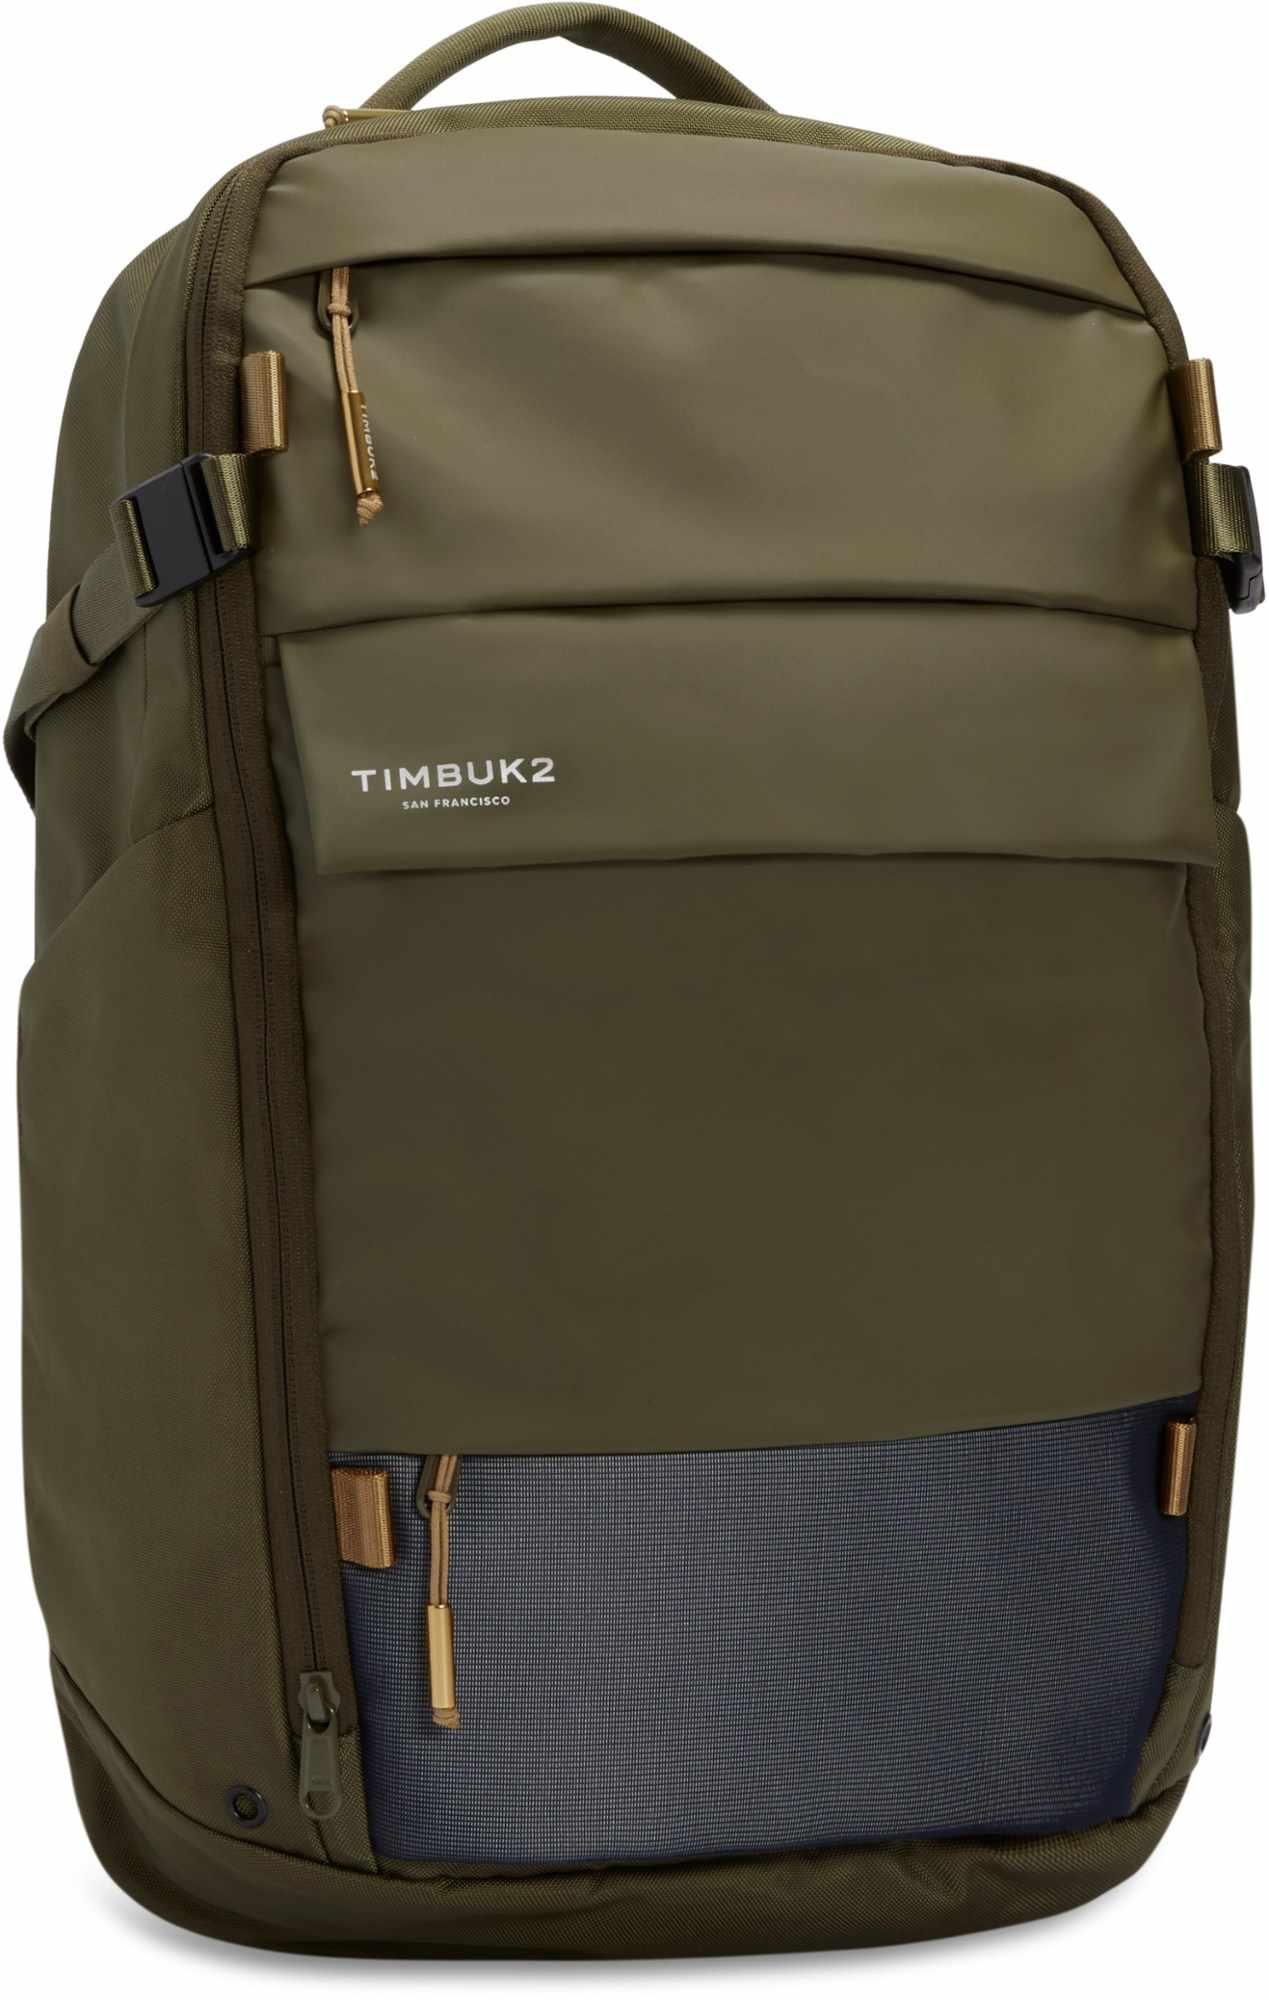 Timbuk2 Parker Commuter Pack